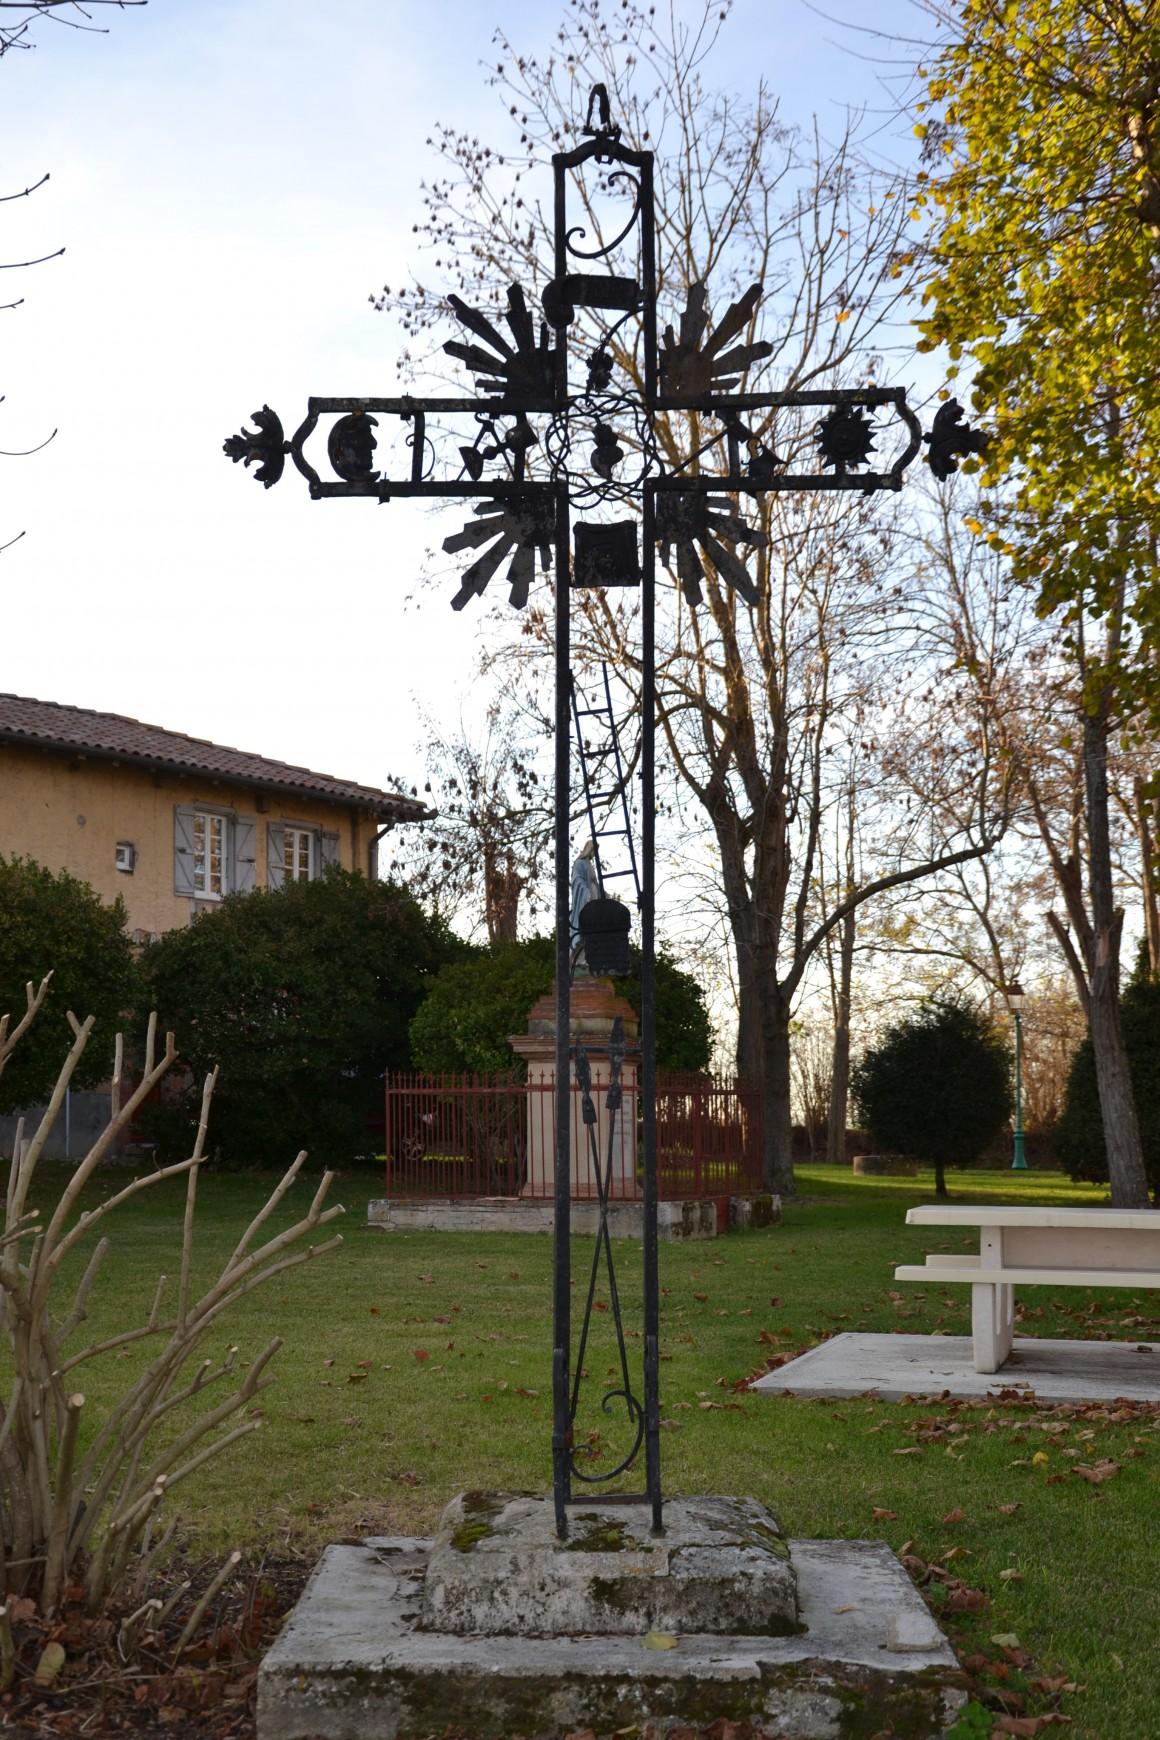 Laymont - Croix de Jean-Pierre Bertin